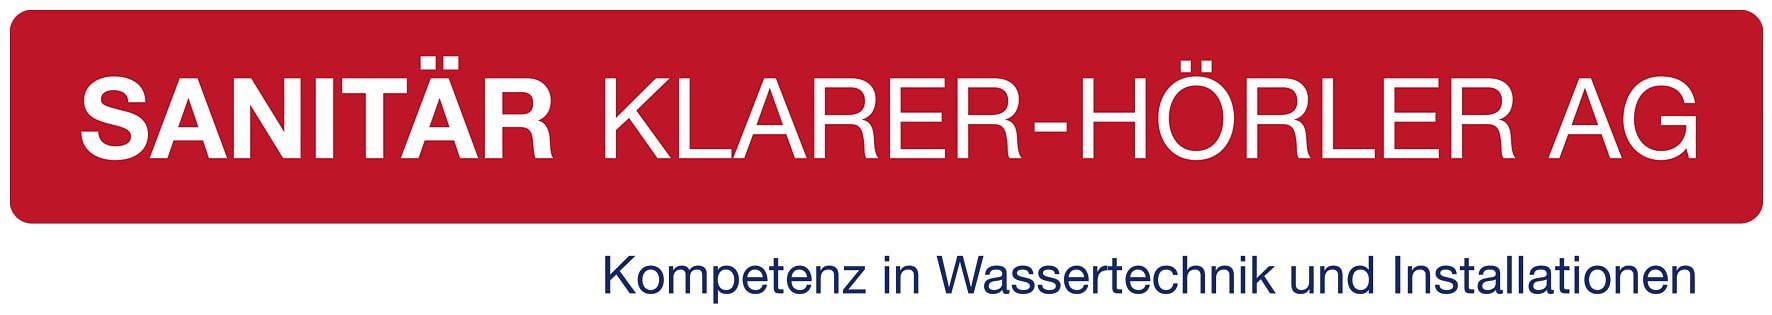 Sanitär Klarer-Hörler AG